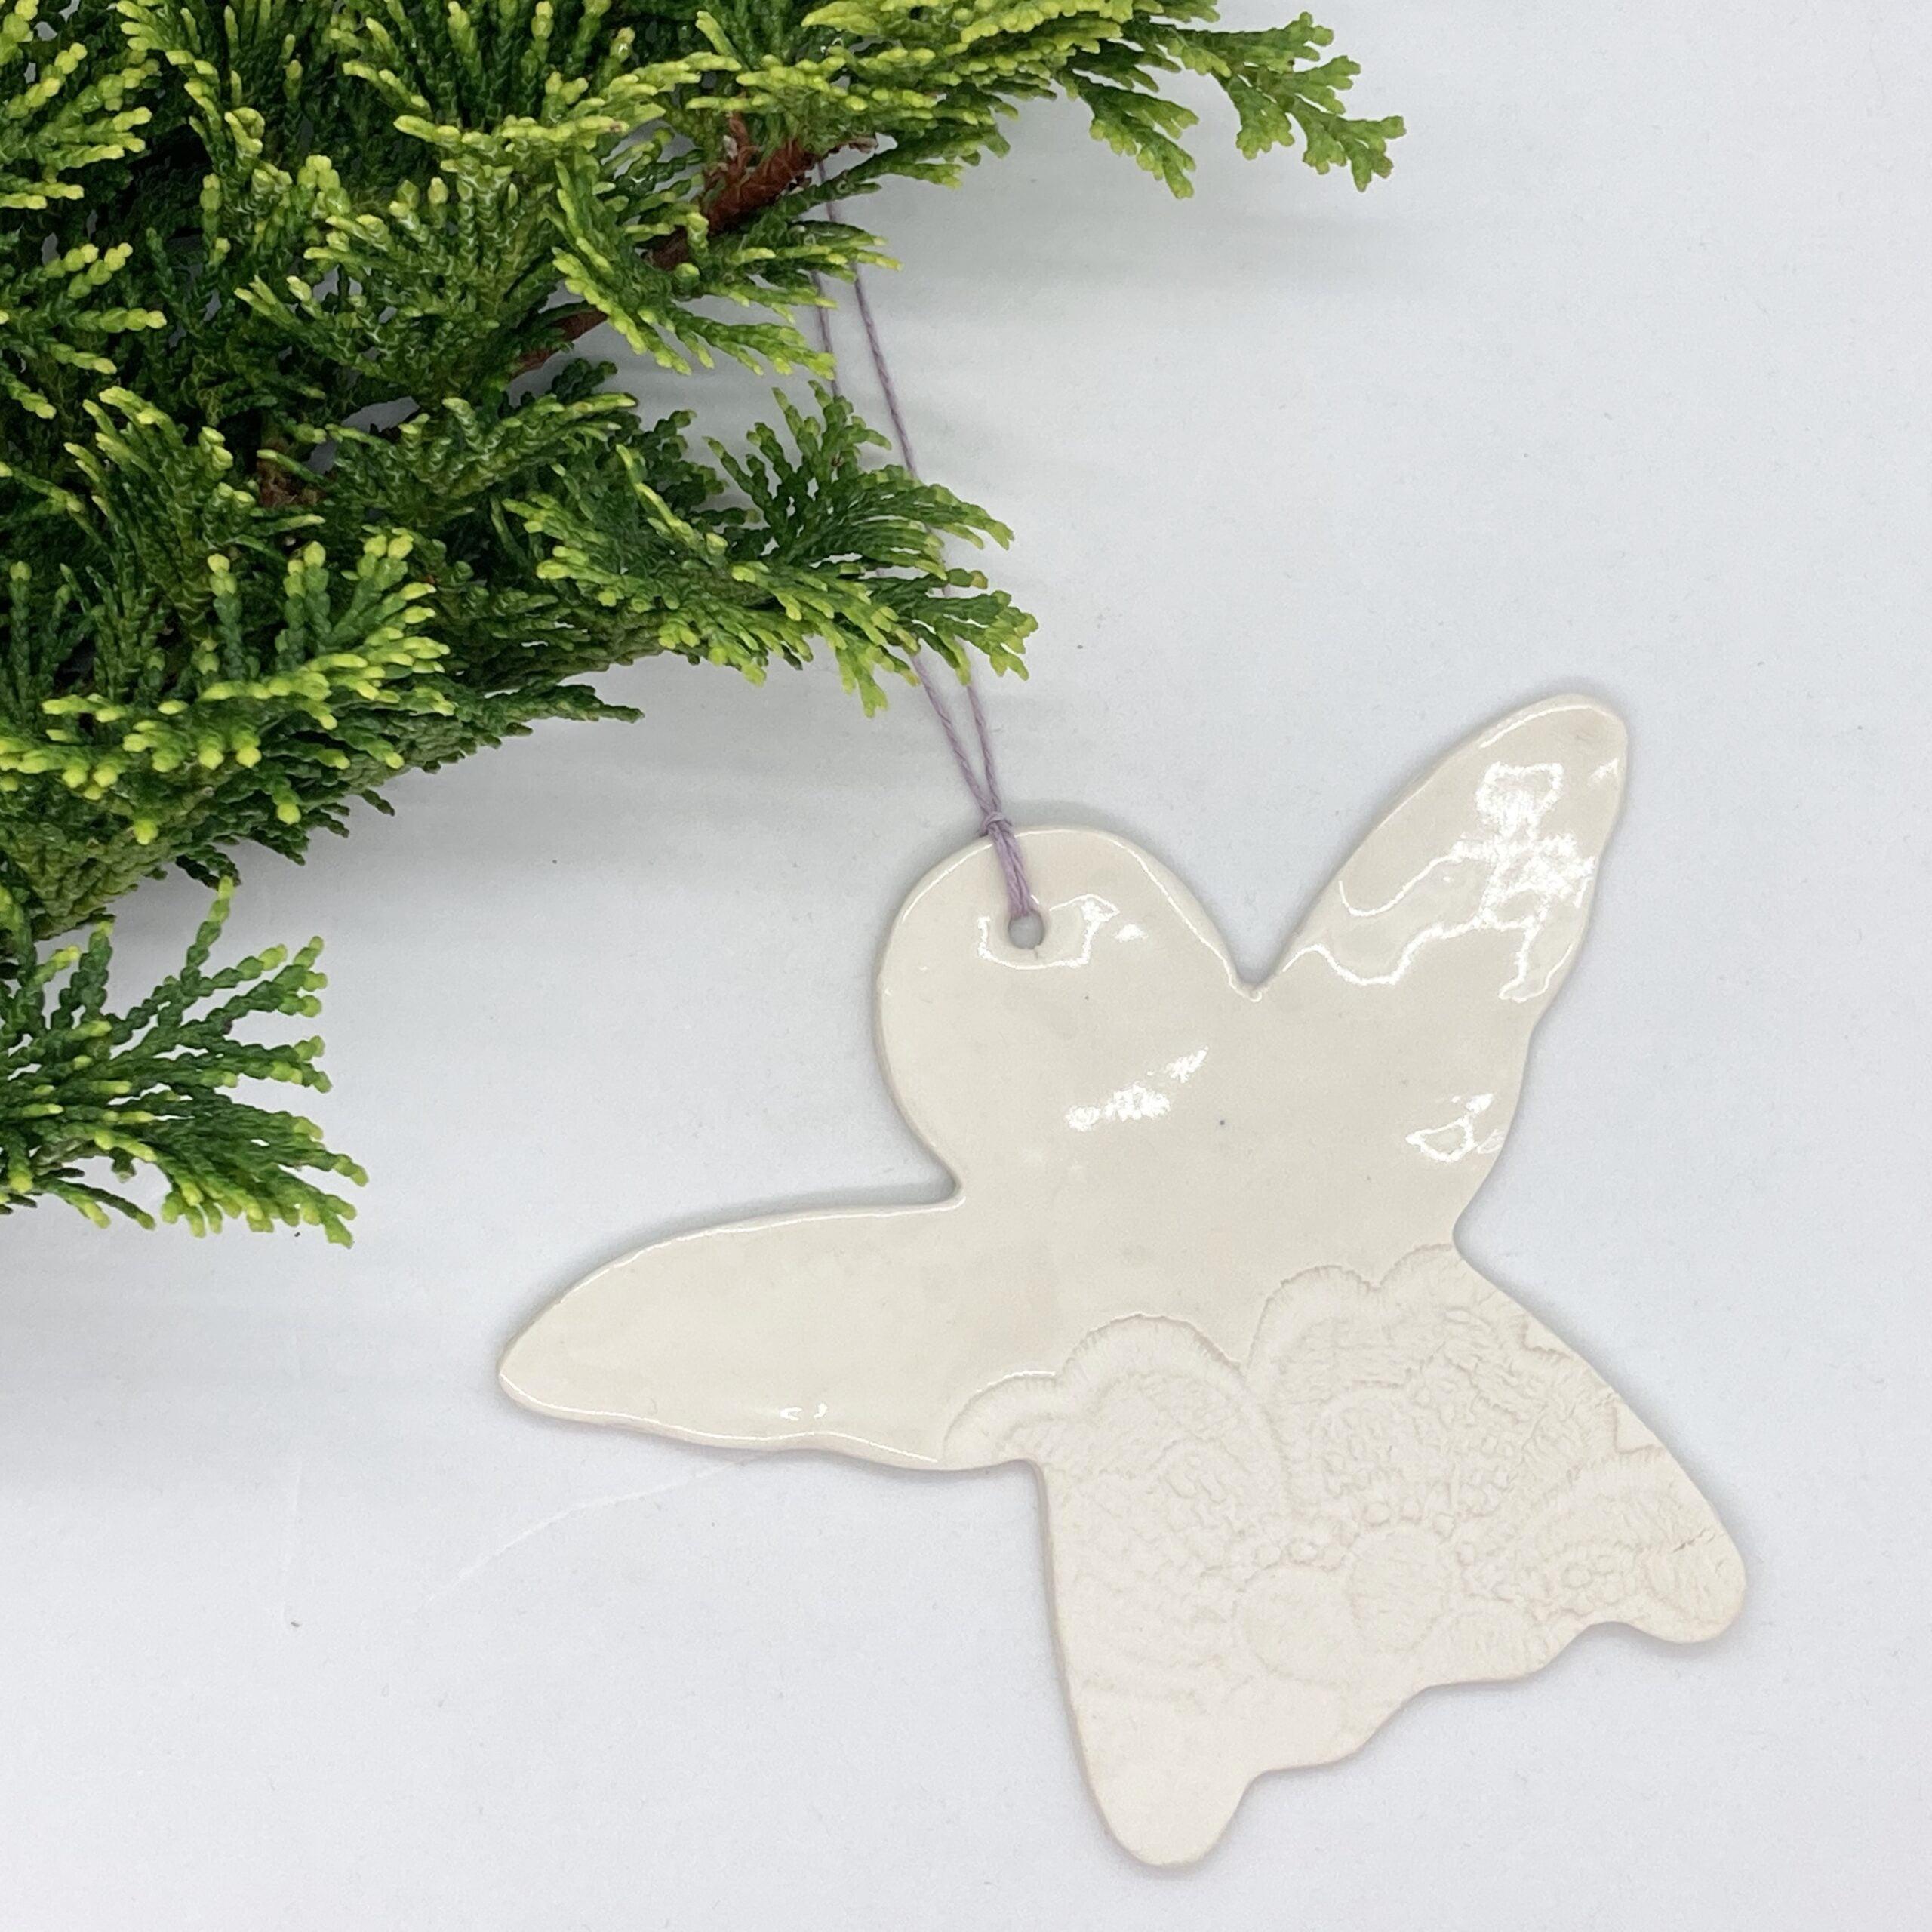 Angel Christmas decorations